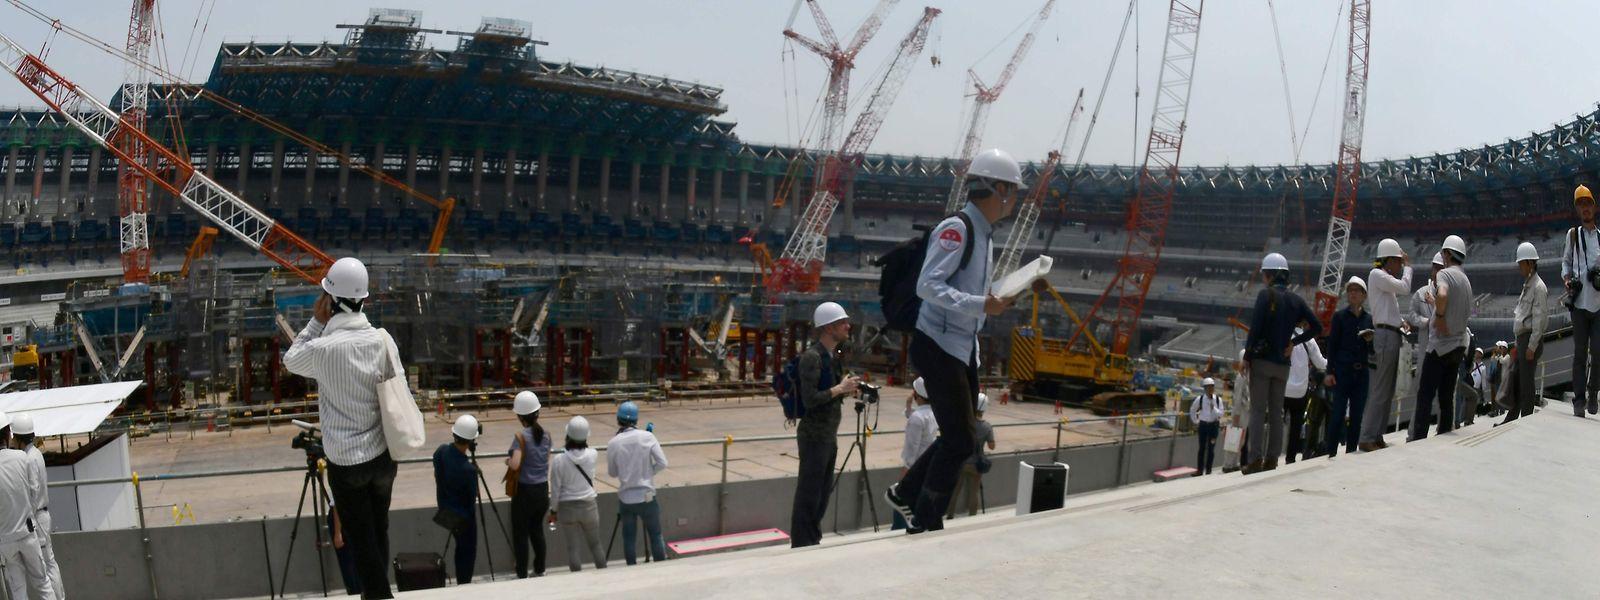 Le stade olympique de Tokyo en construction: le calme avant la tempête?